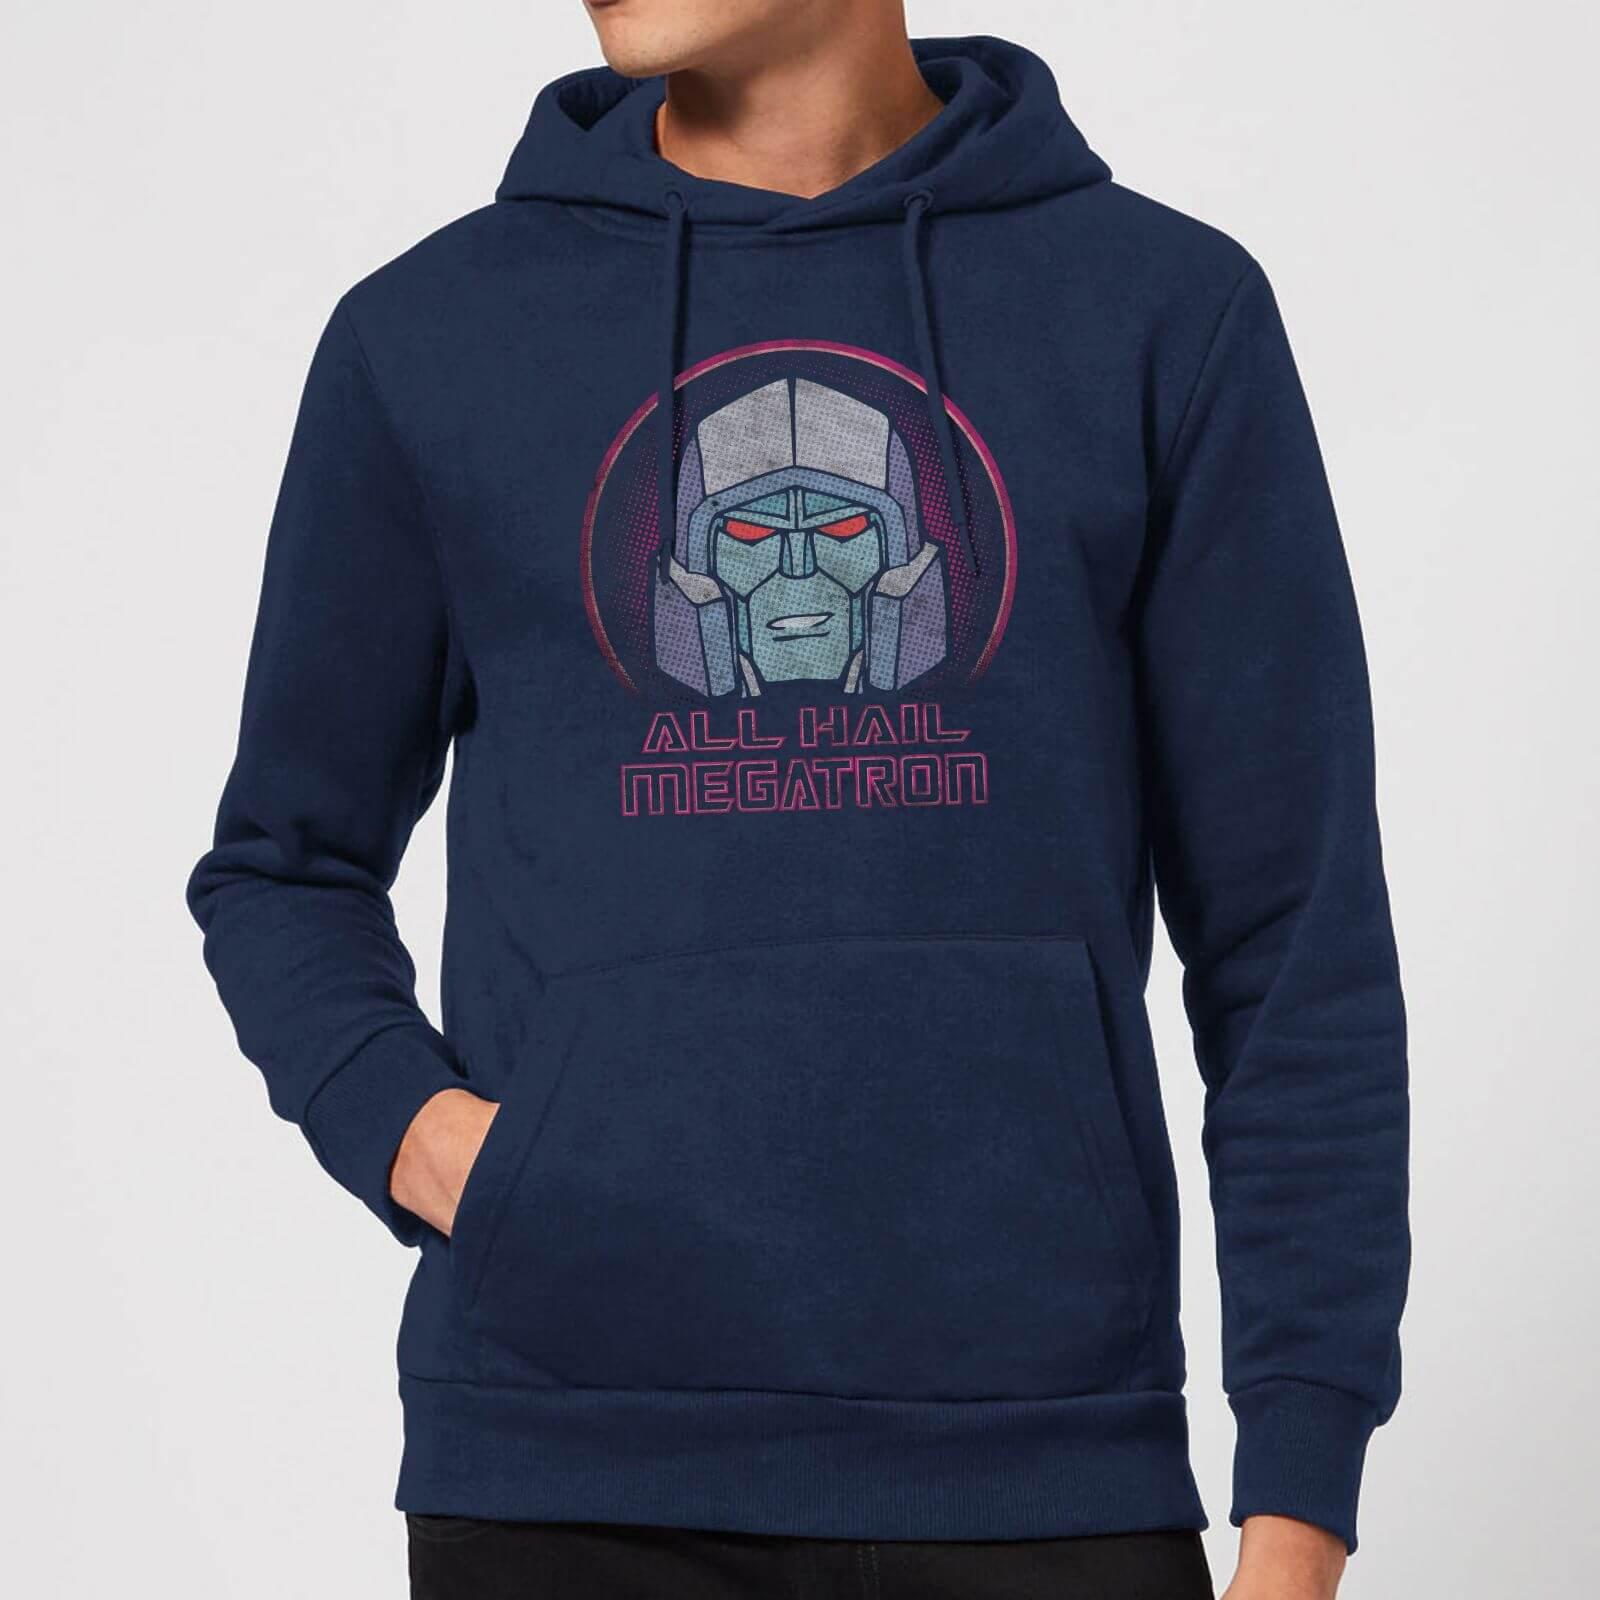 Transformers All Hail Megatron Hoodie   Navy   L   Navy